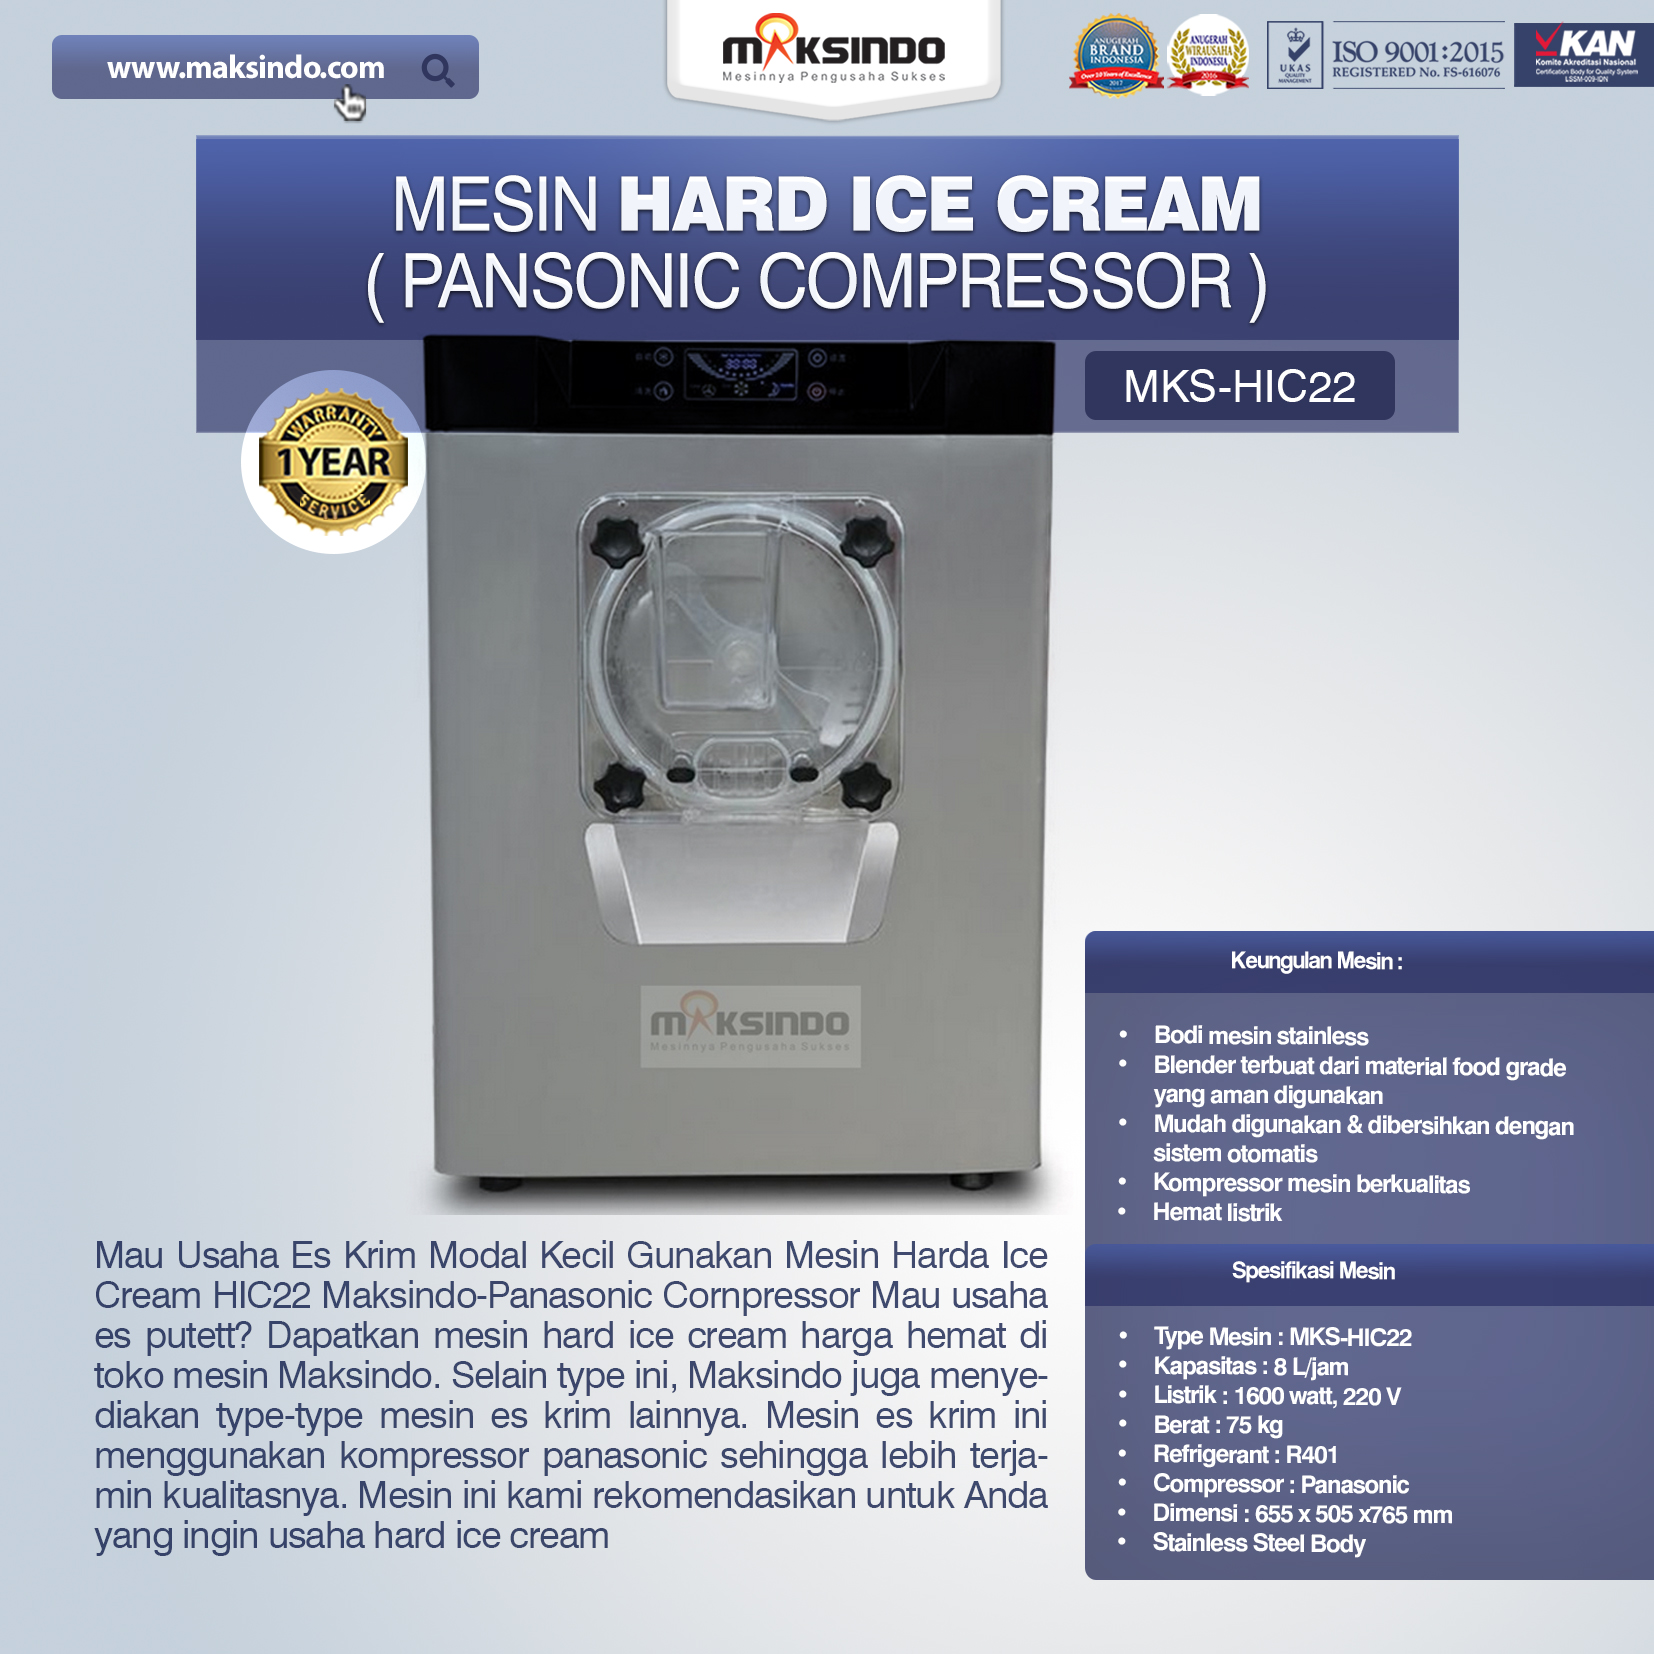 Jual Mesin Hard Ice Cream (HIC22) di Malang